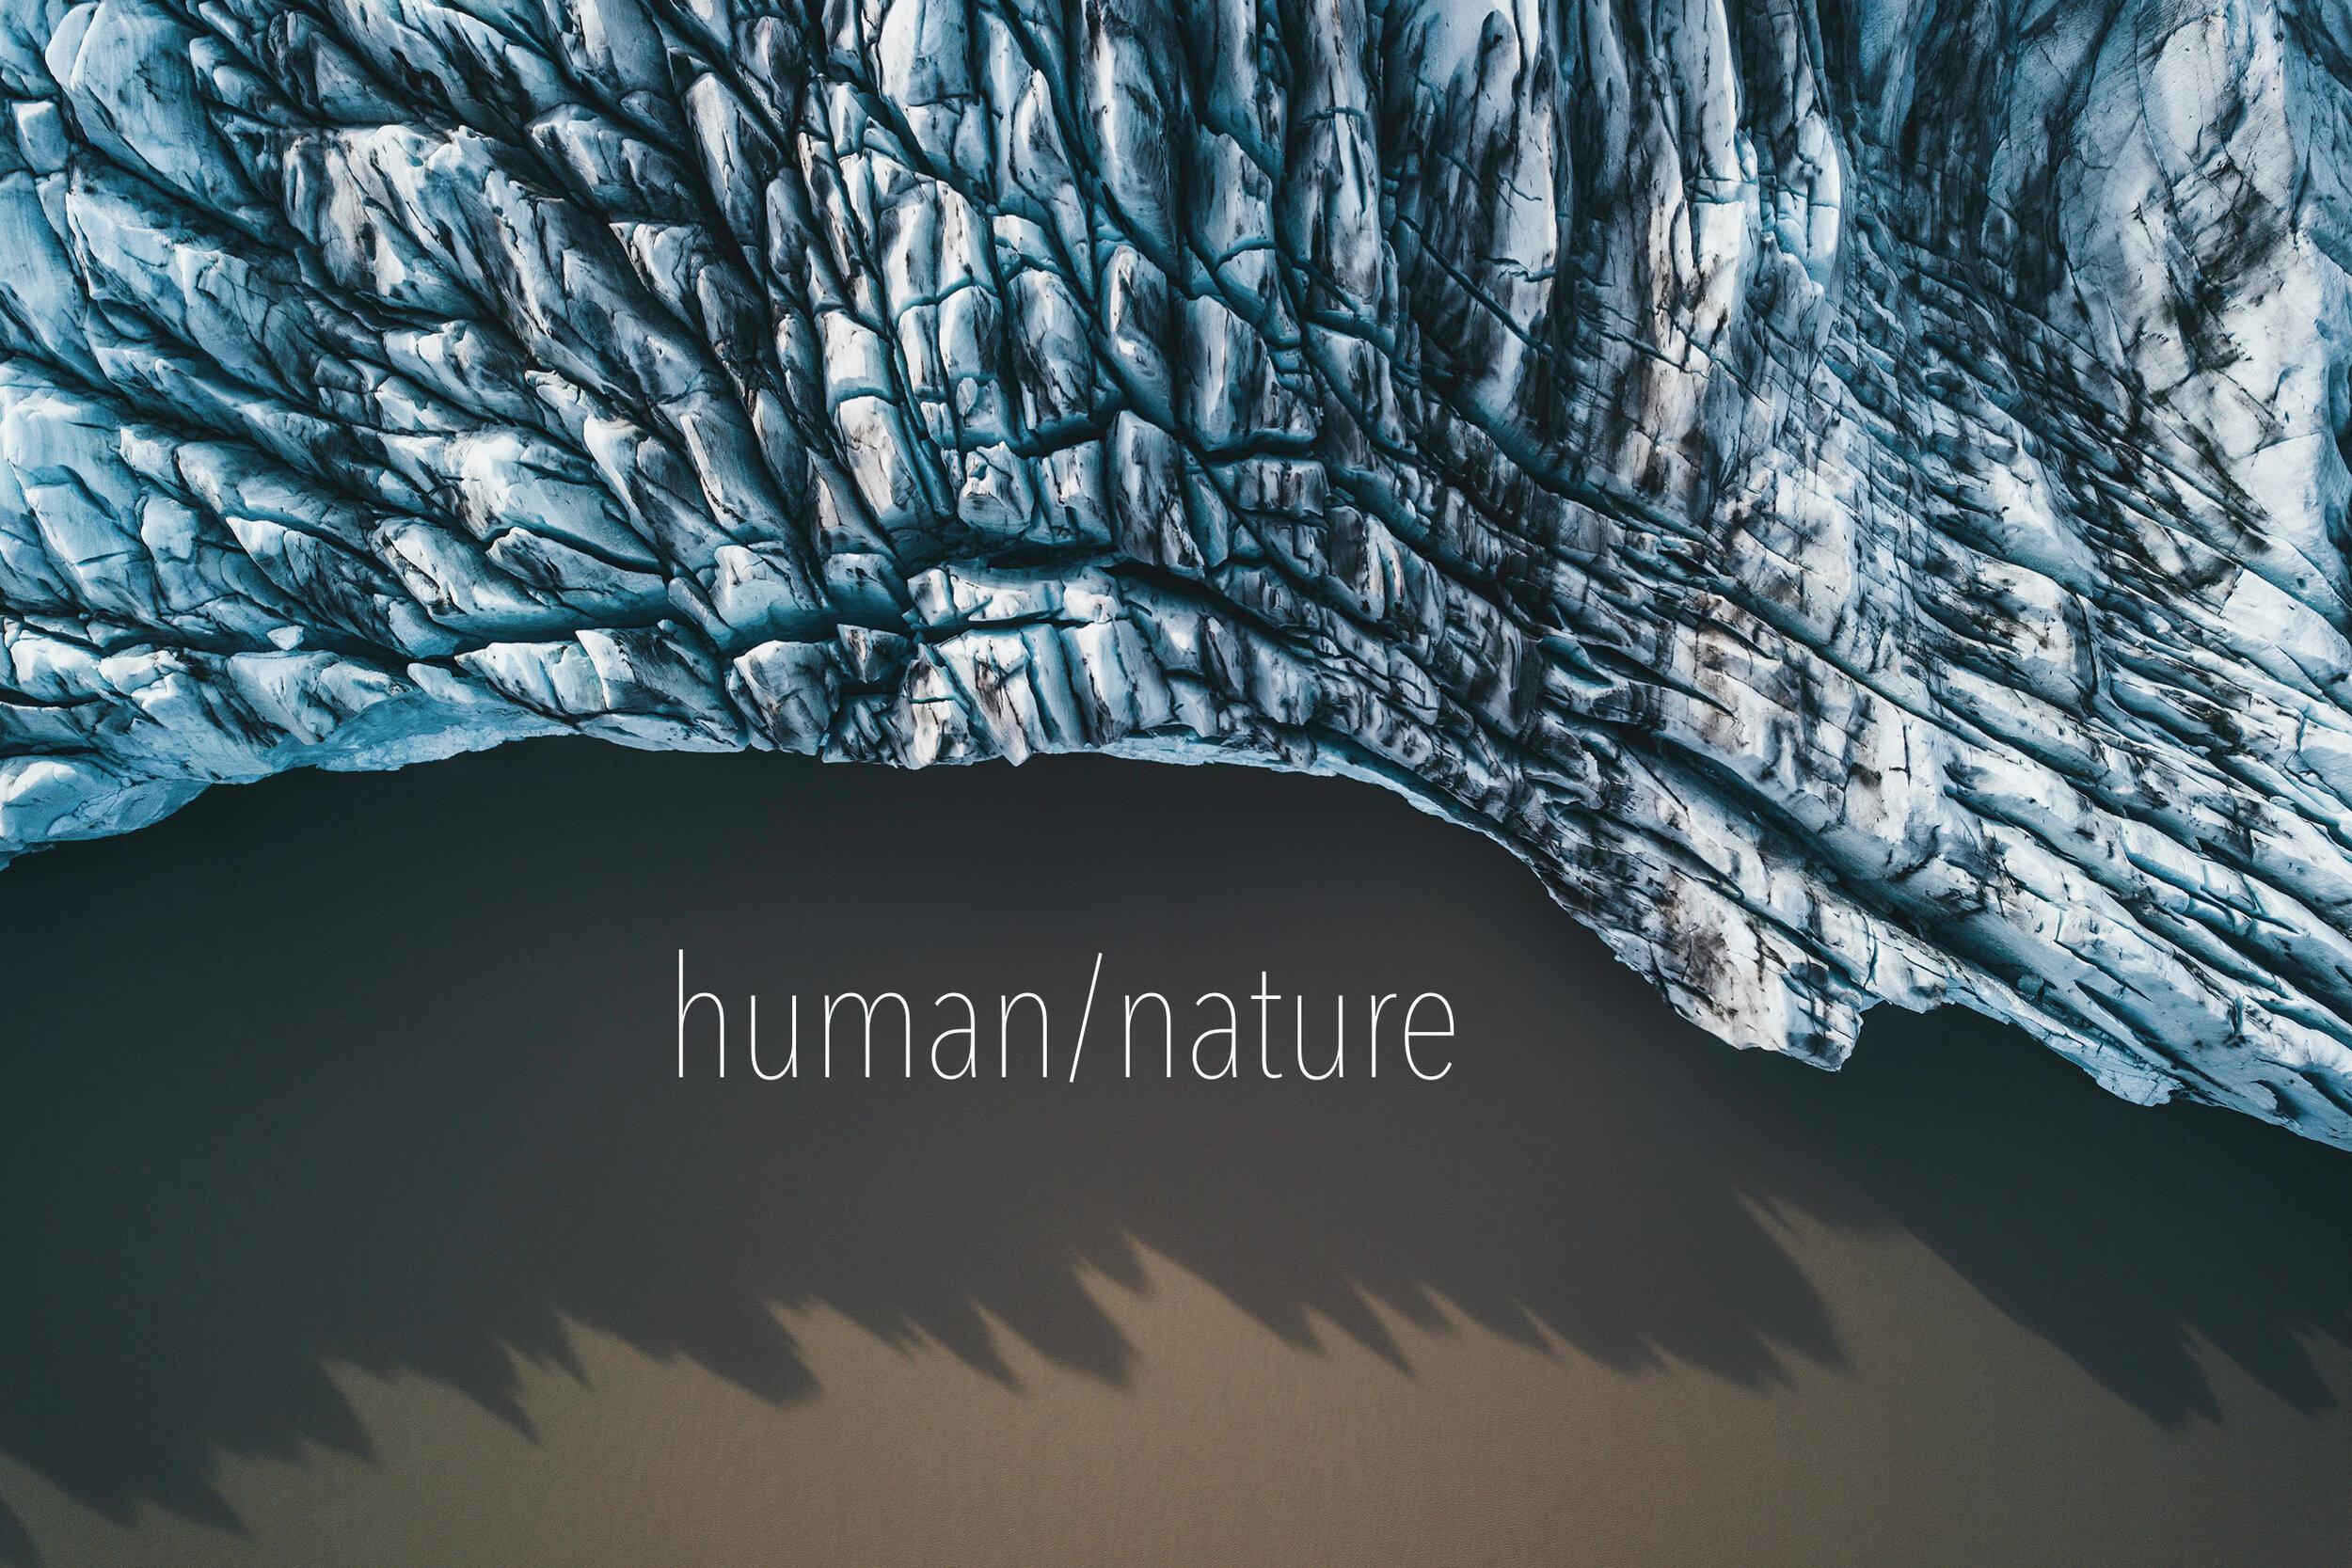 humannaturefb2.JPG